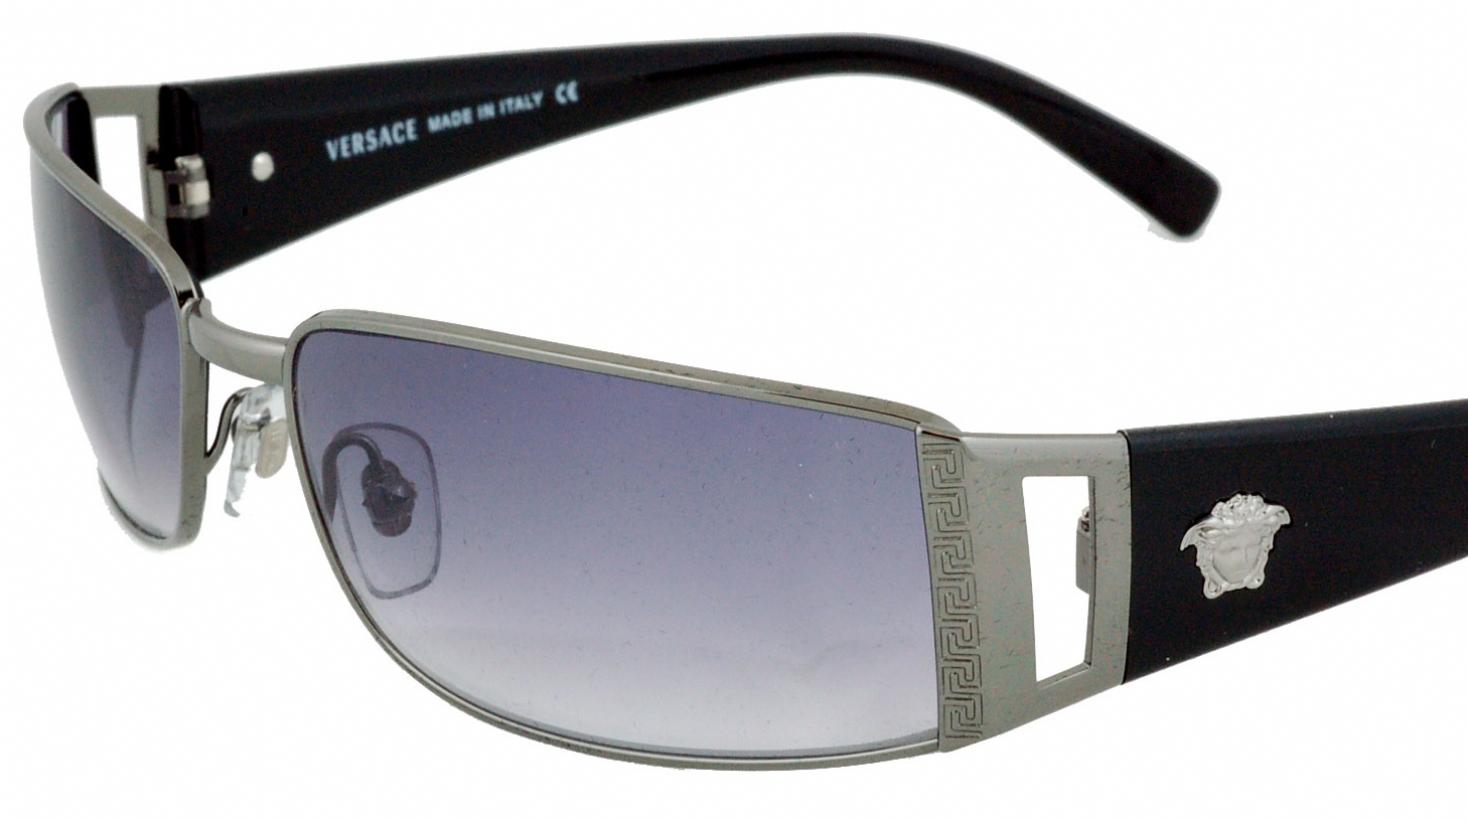 Versace Sunglasses 2021 Cinemas 93